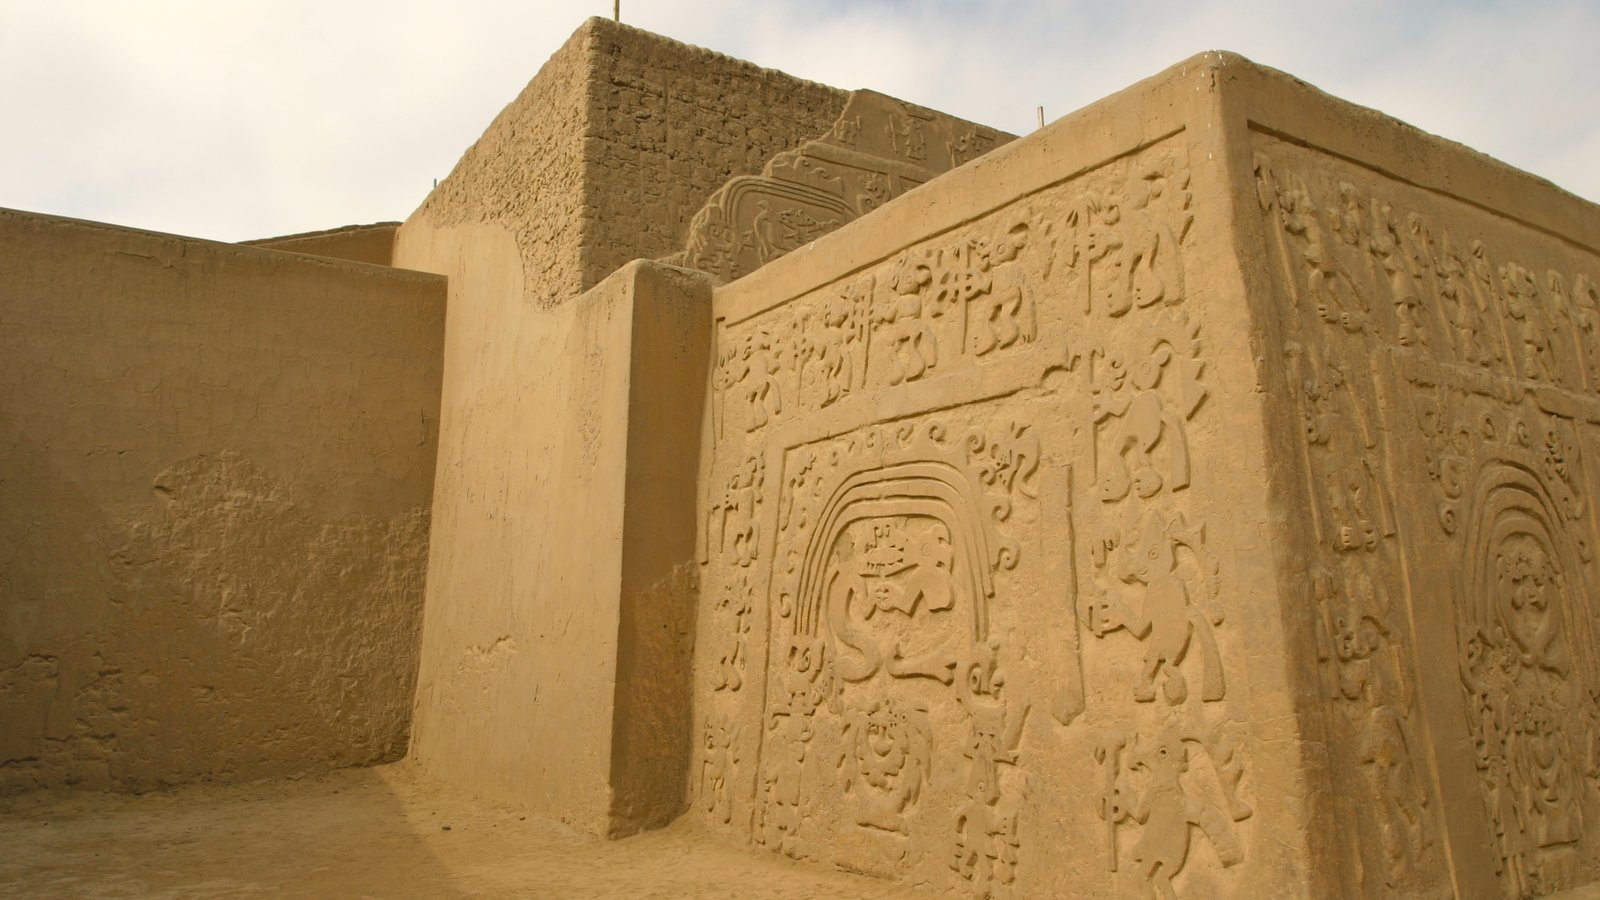 Trujillo caracterizando elementos de patrimônio, arquitetura de patrimônio e uma ruína